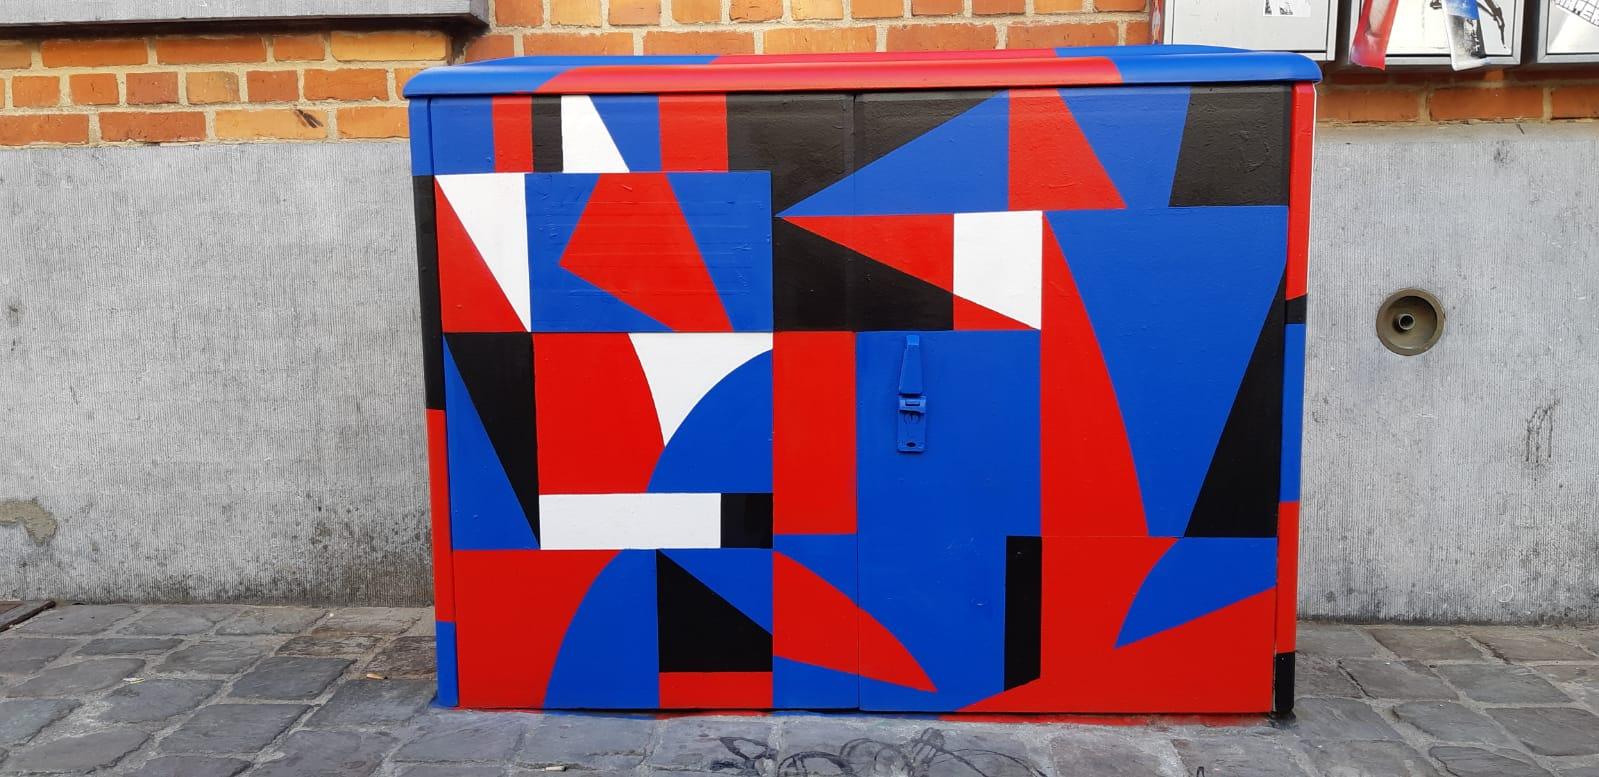 https://www.propaganza.be/wp-content/uploads/2020/02/mobilier-urbain-_-artiste-B-Hendlisz-_-Ixelles3-copie.jpg